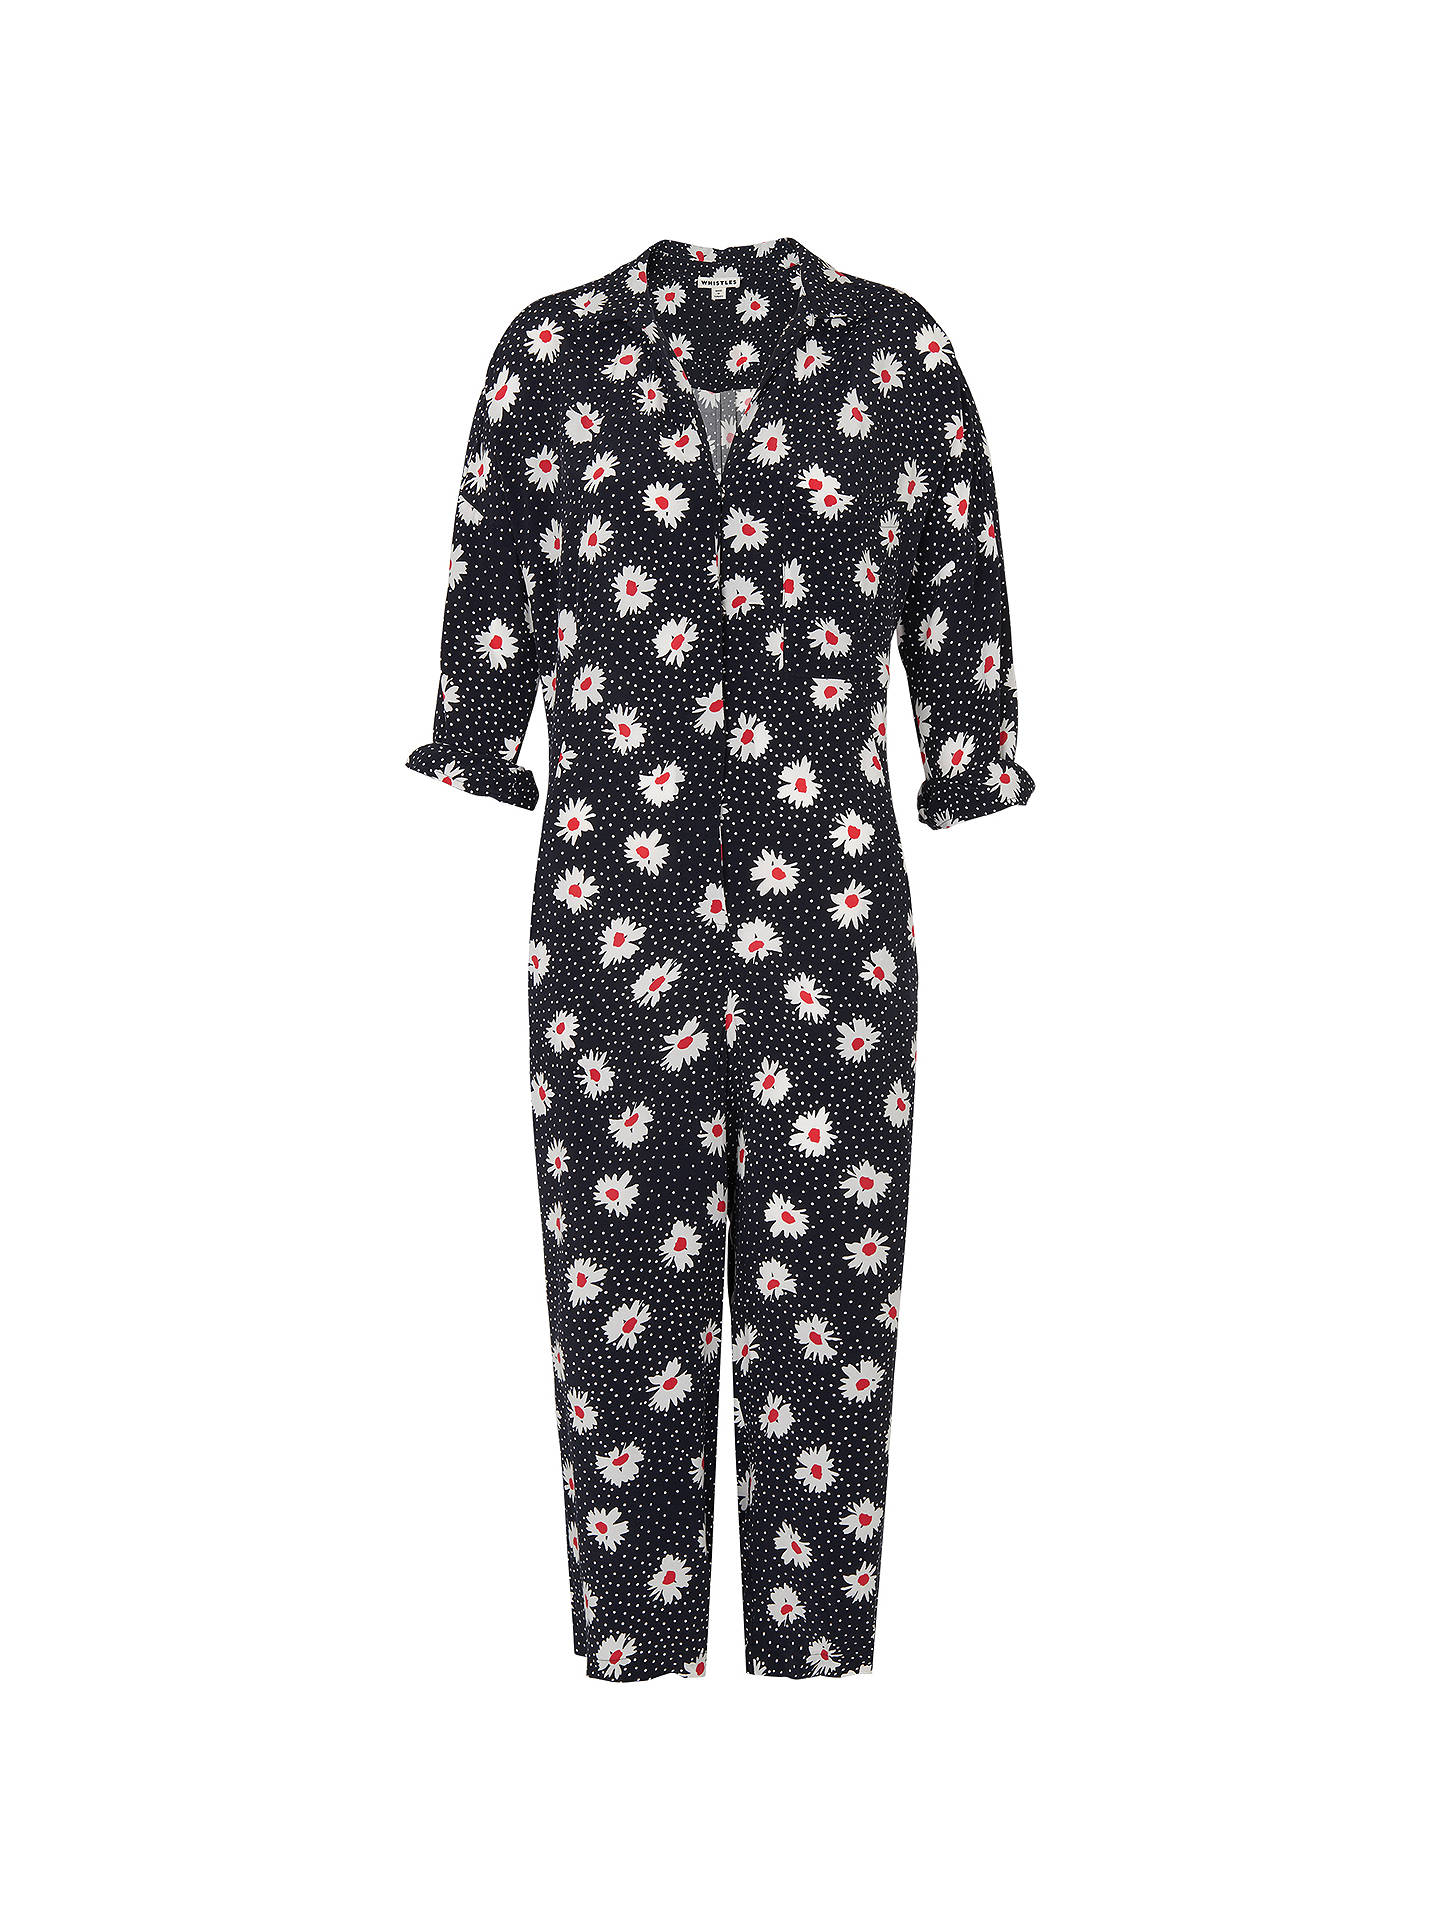 560b62c4638 ... Buy Whistles Daisy Spot Jumpsuit